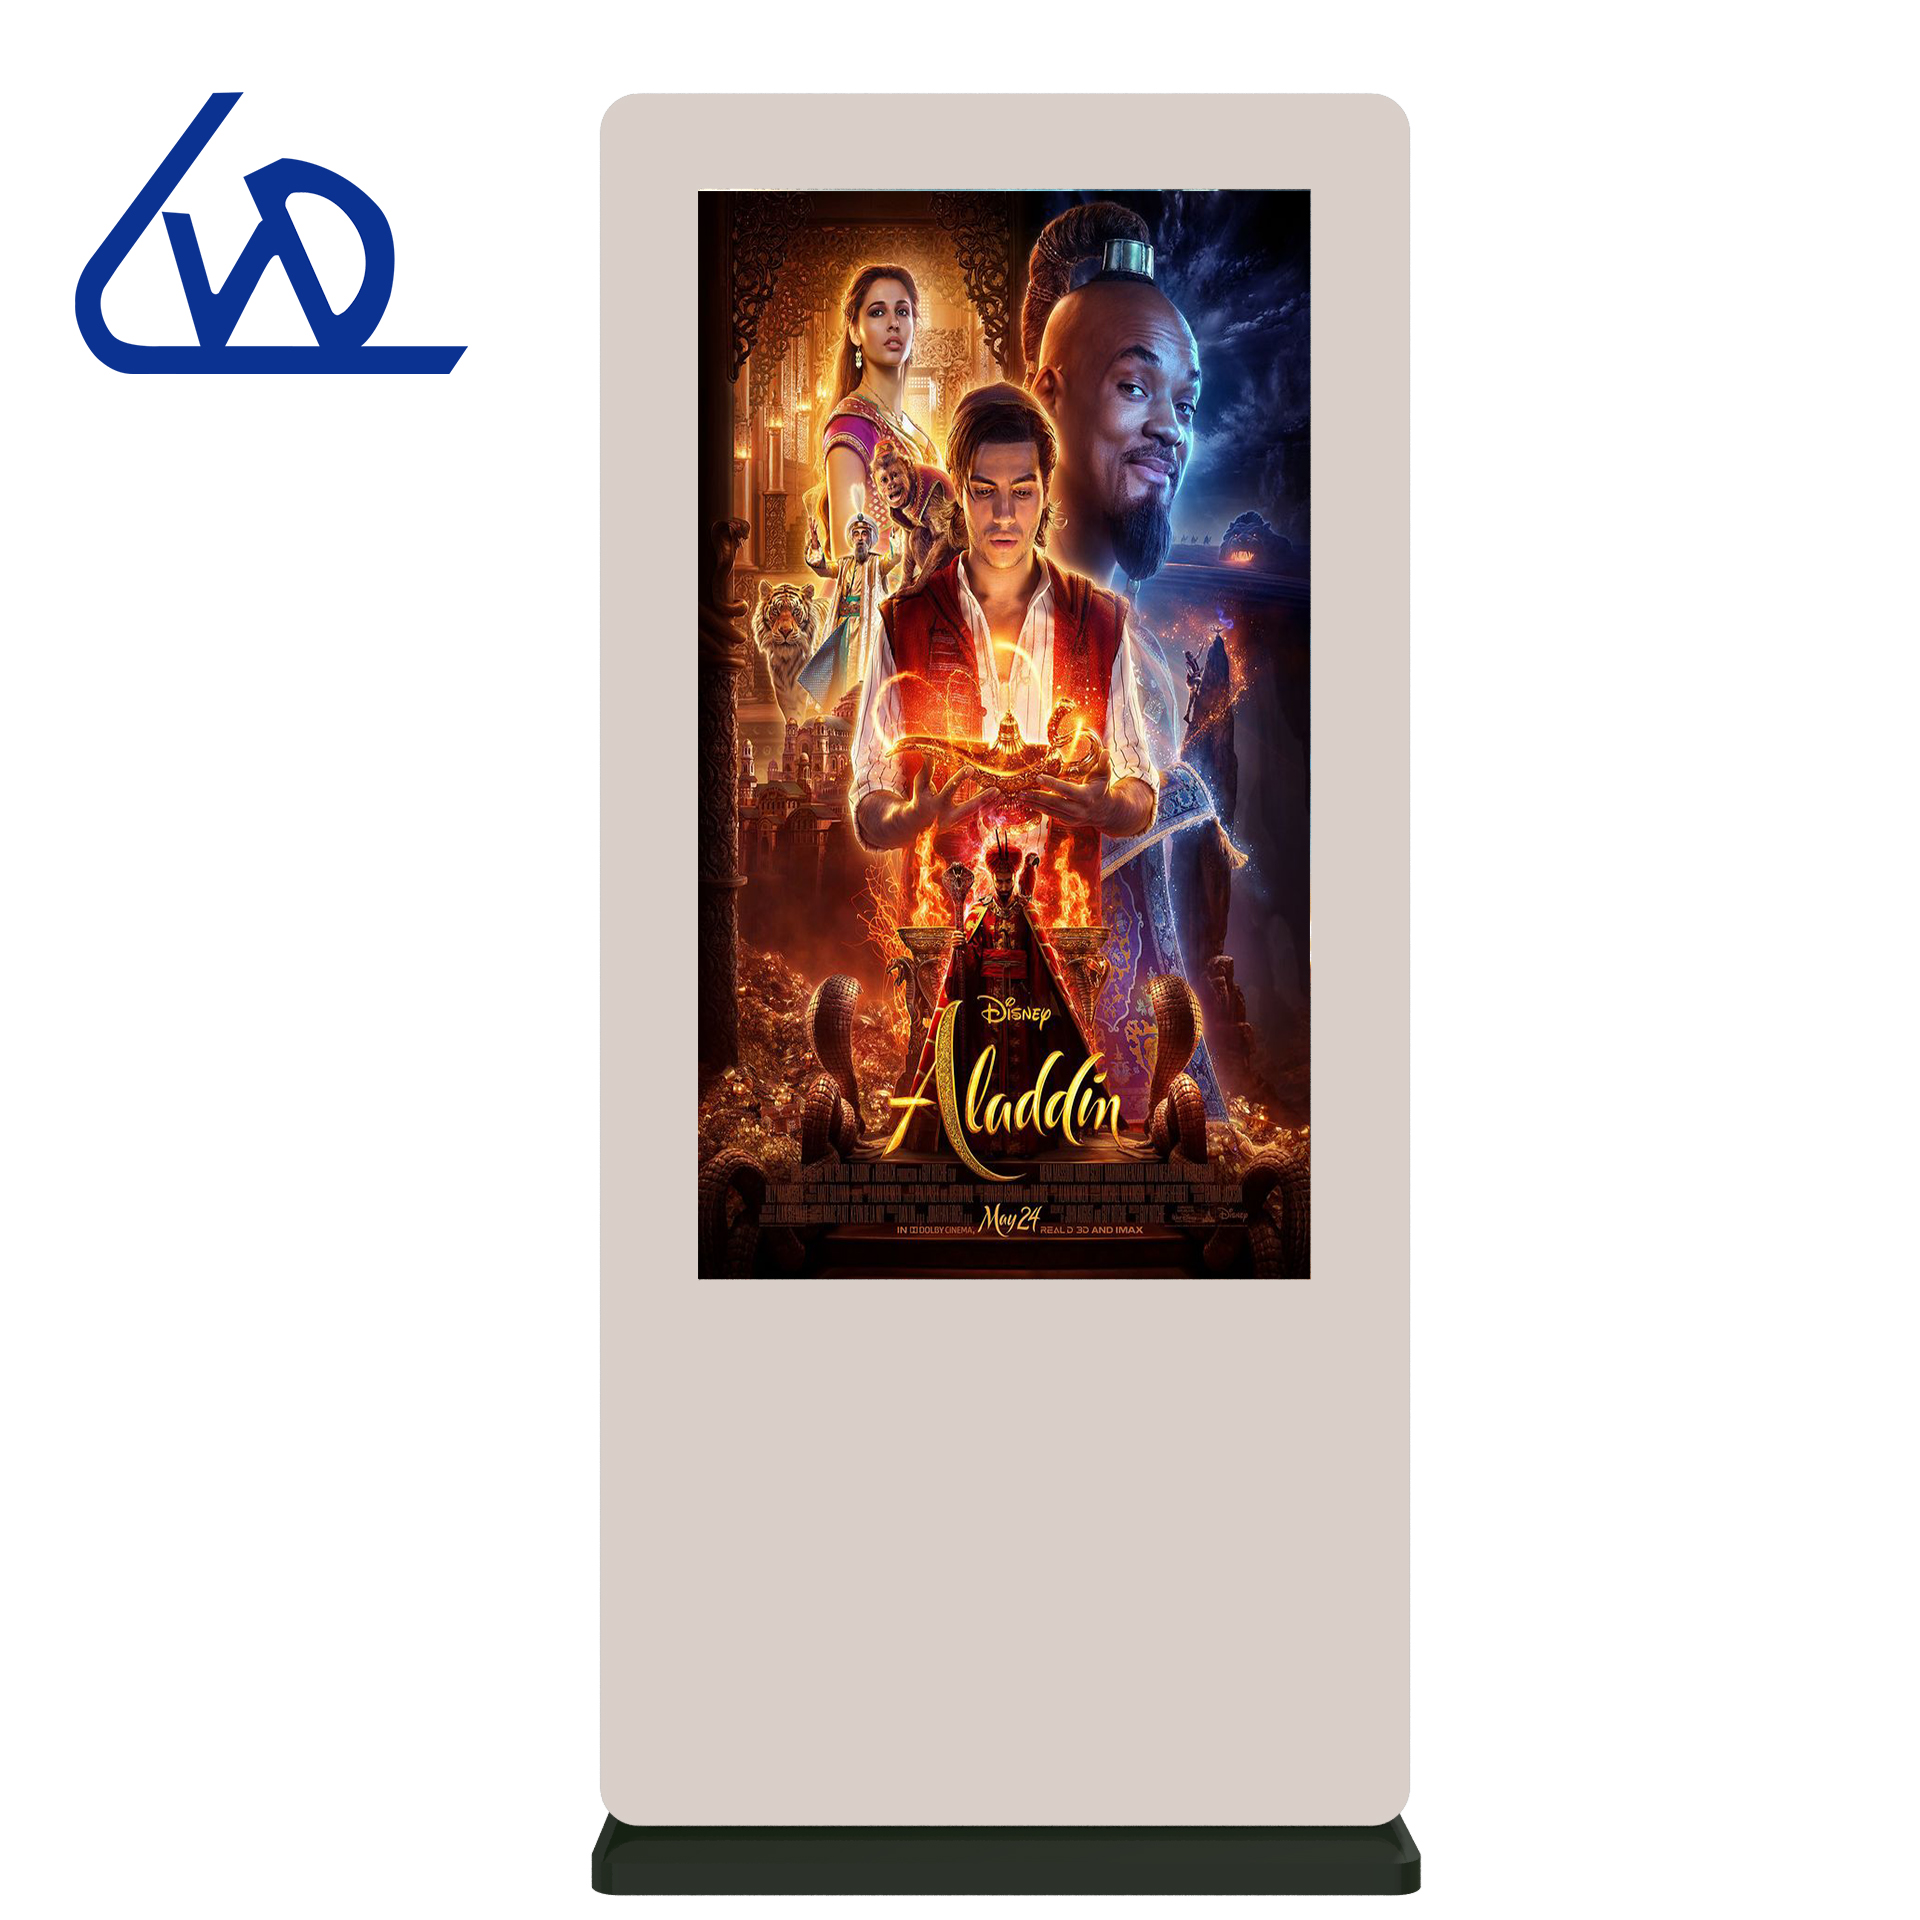 Harga Pabrik Luar Ruangan Ultra Tipis Lantai Berdiri Layar Sentuh LCD LED Display Advertising Pemain Totem Ip65 Digital Signage Kios